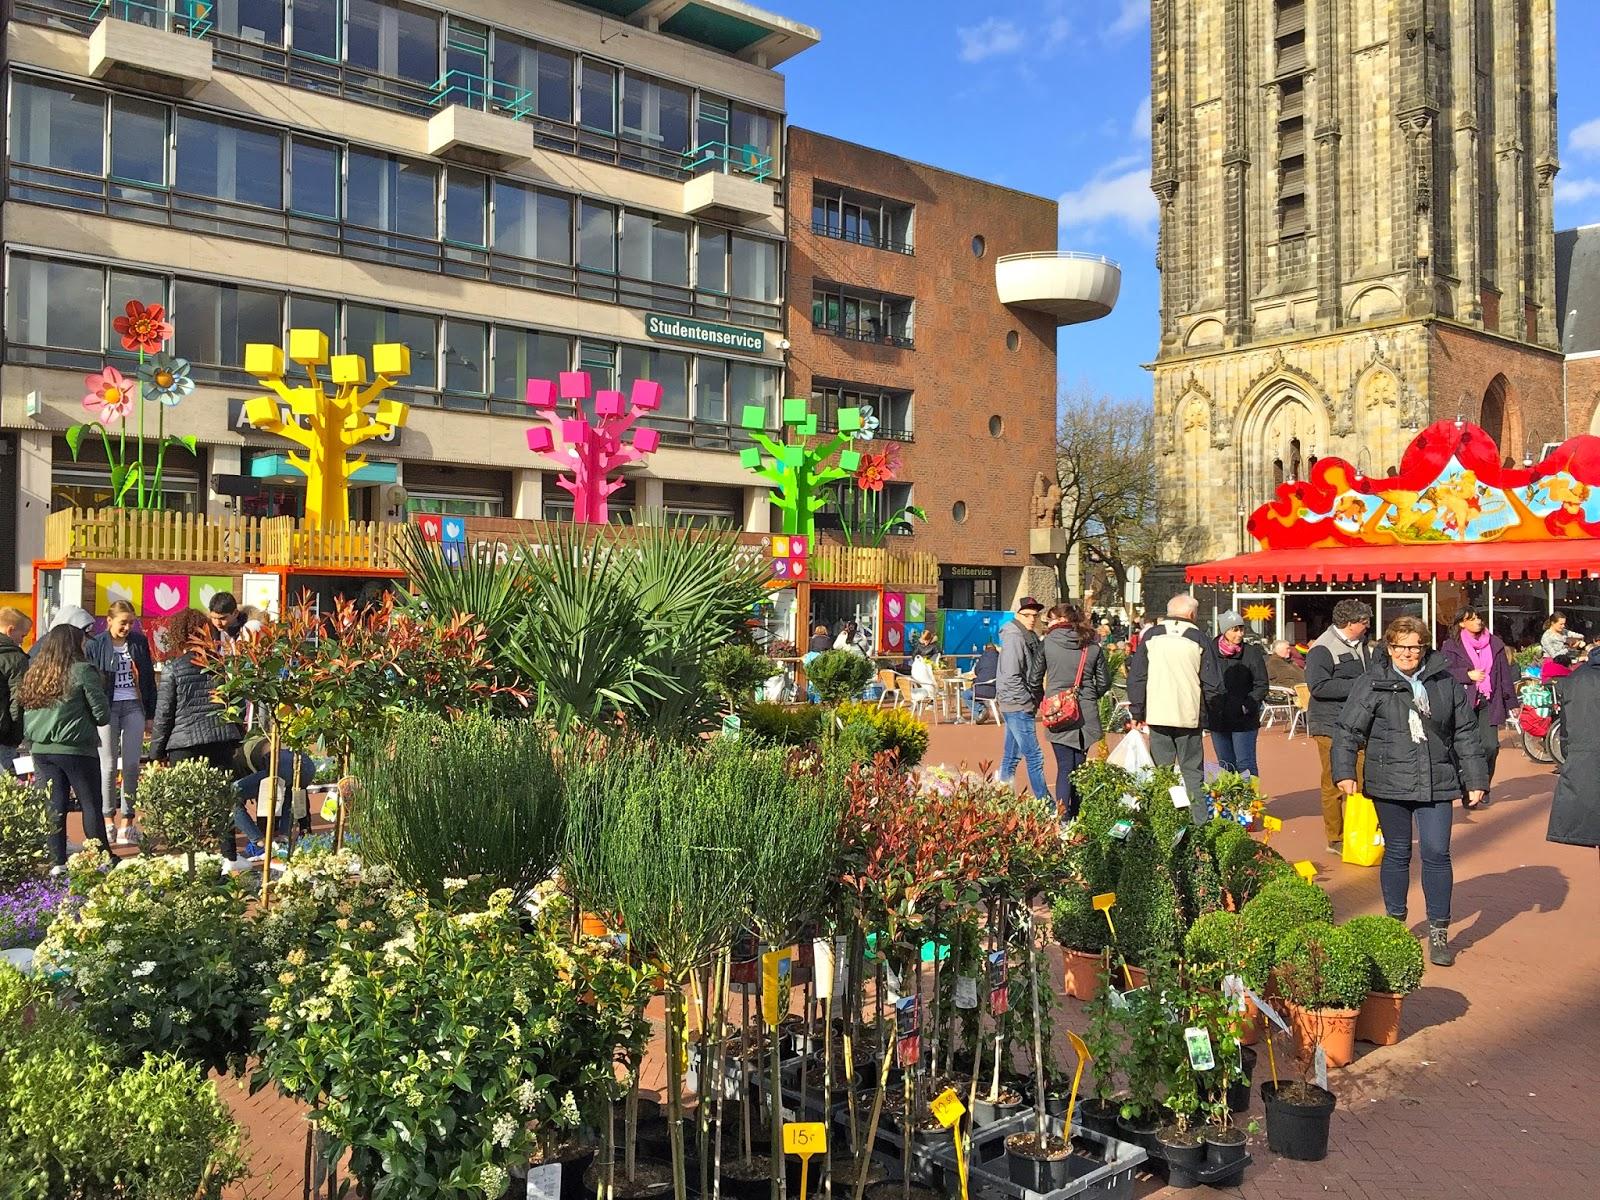 Flower depot in Grote Markt Groningen.